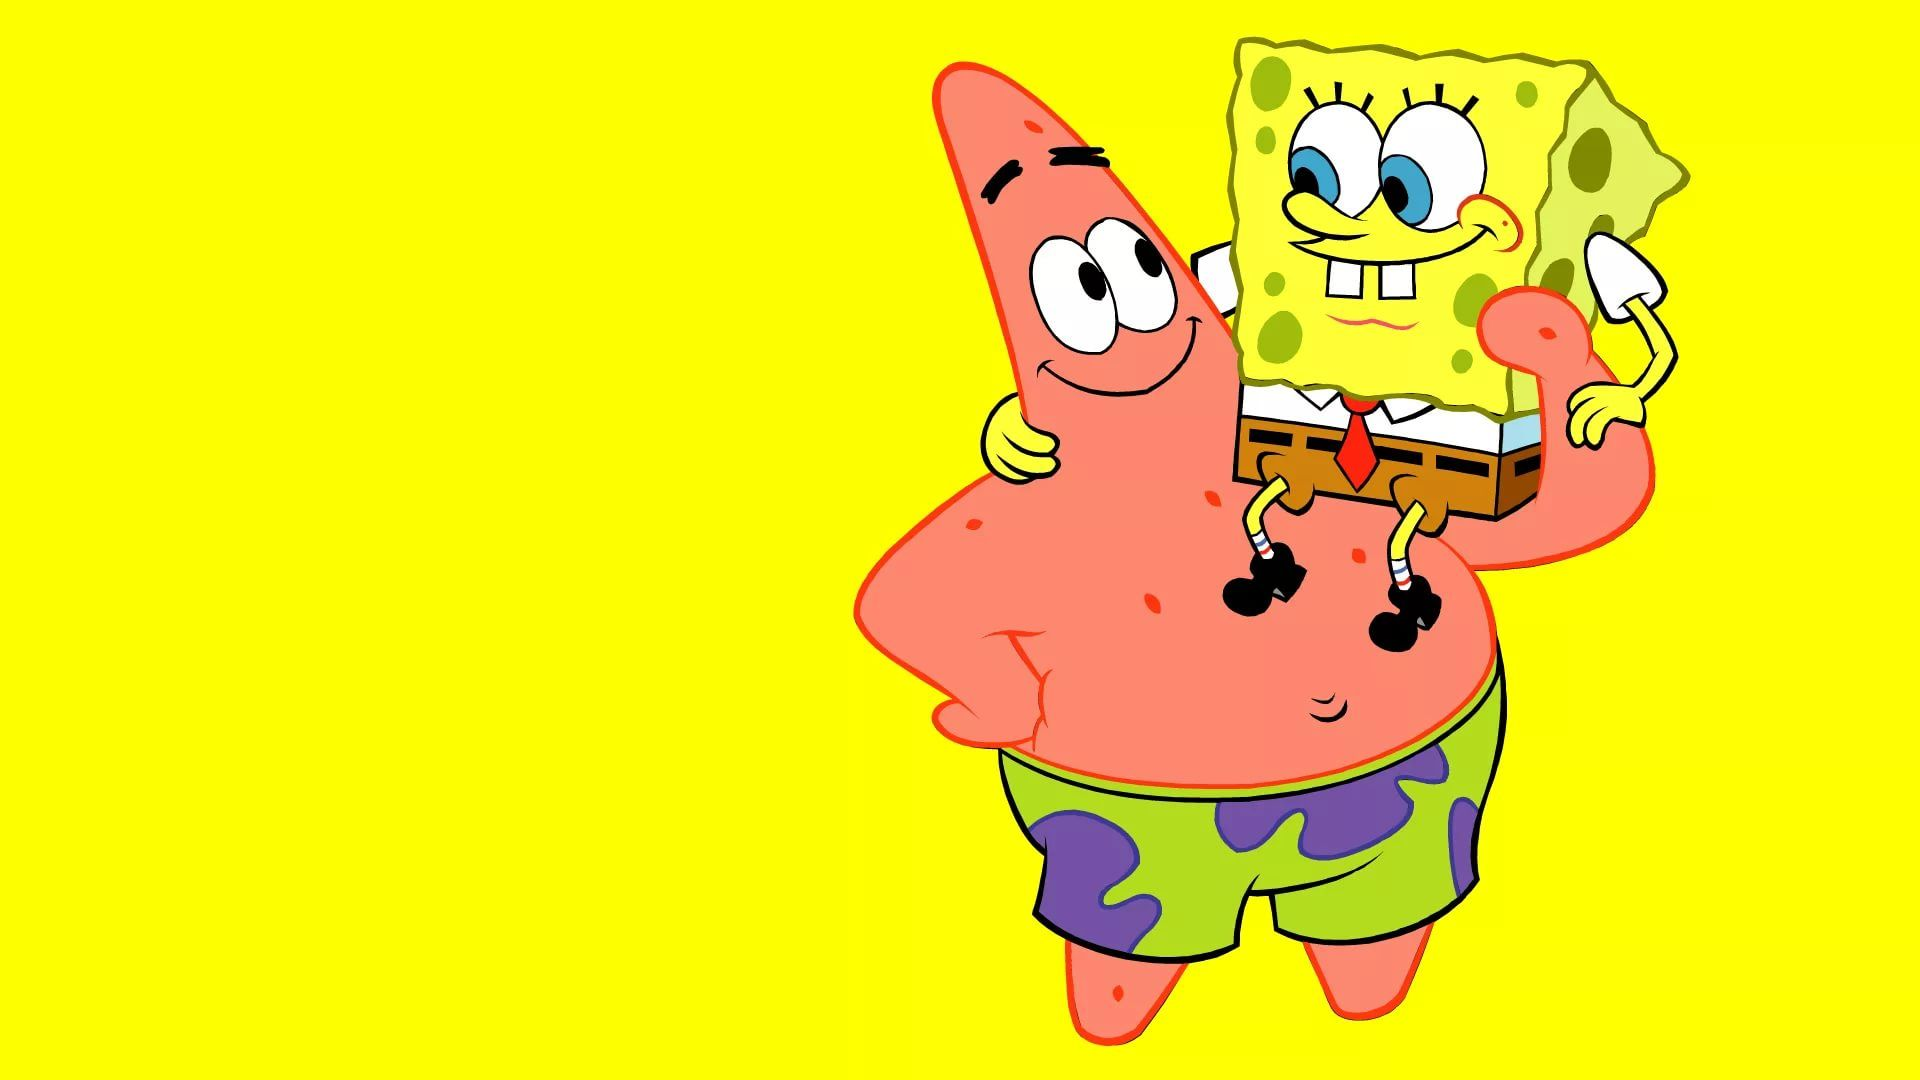 Patrick hd wallpaper download